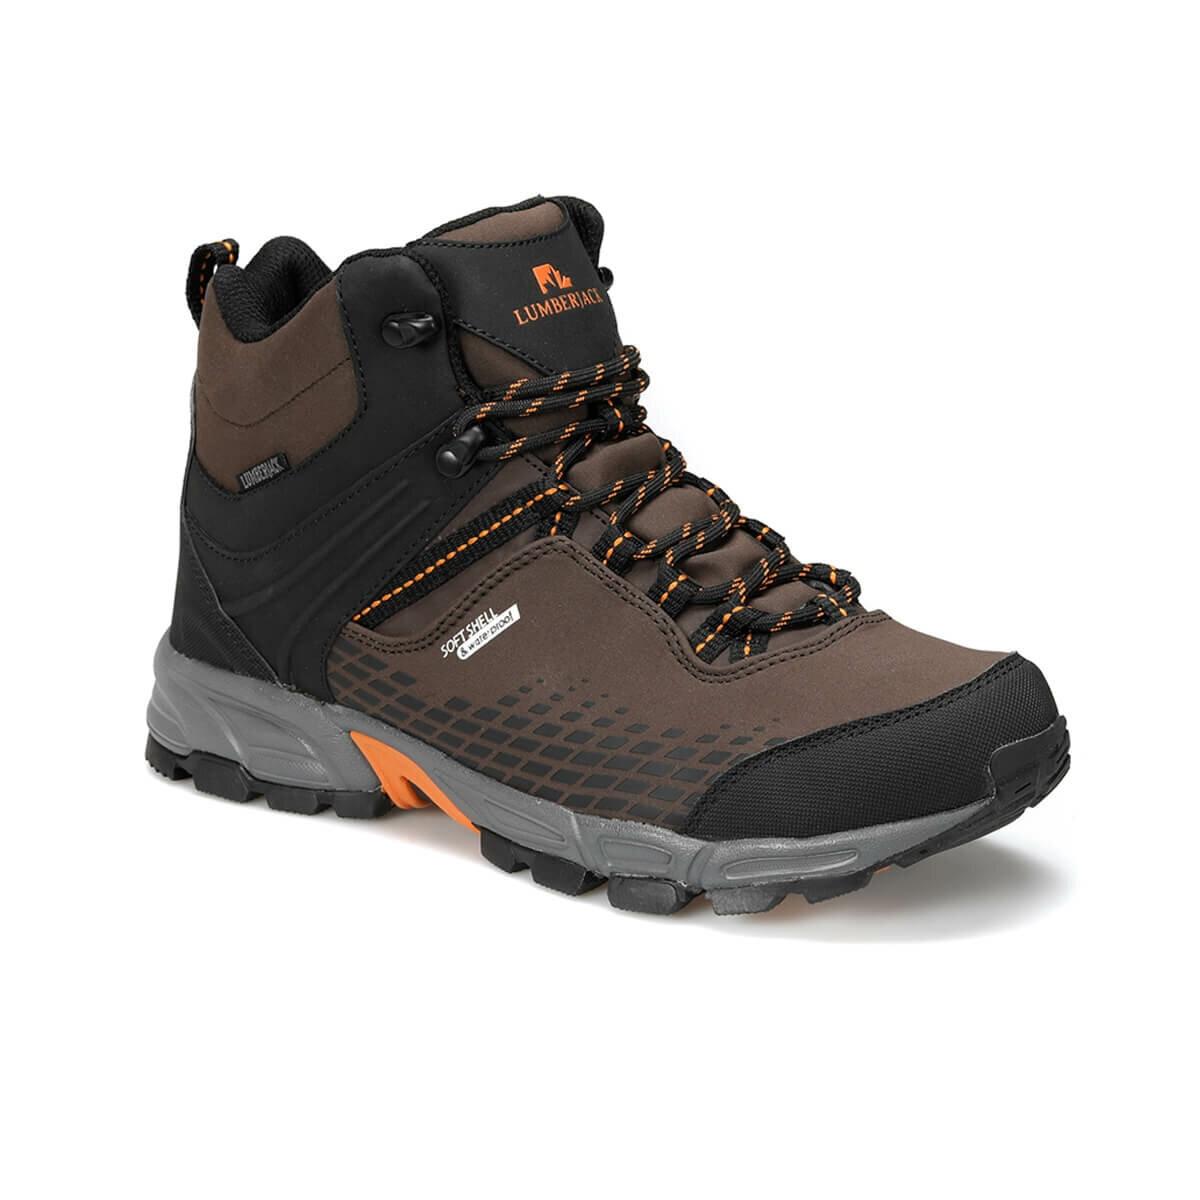 FLO FLAKE HI 9PR Brown Mens Outdoor Boots LUMBERJACK